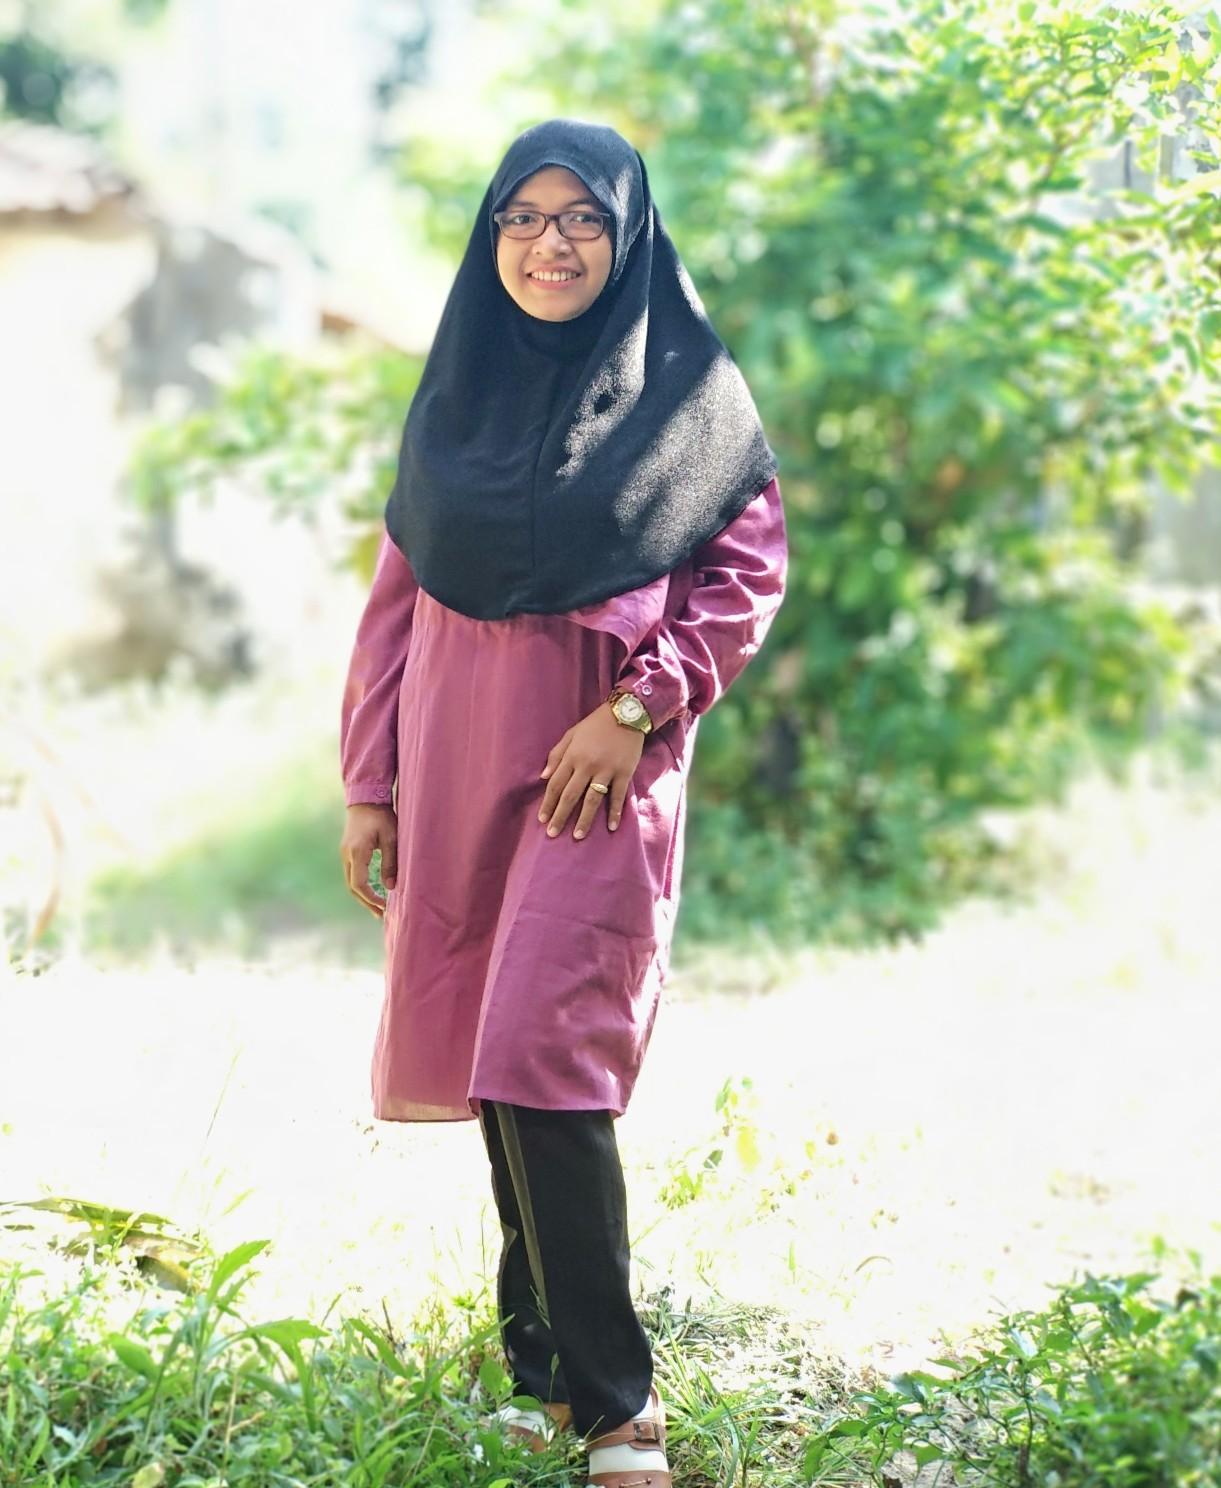 jilbab instan untuk wajah chubby